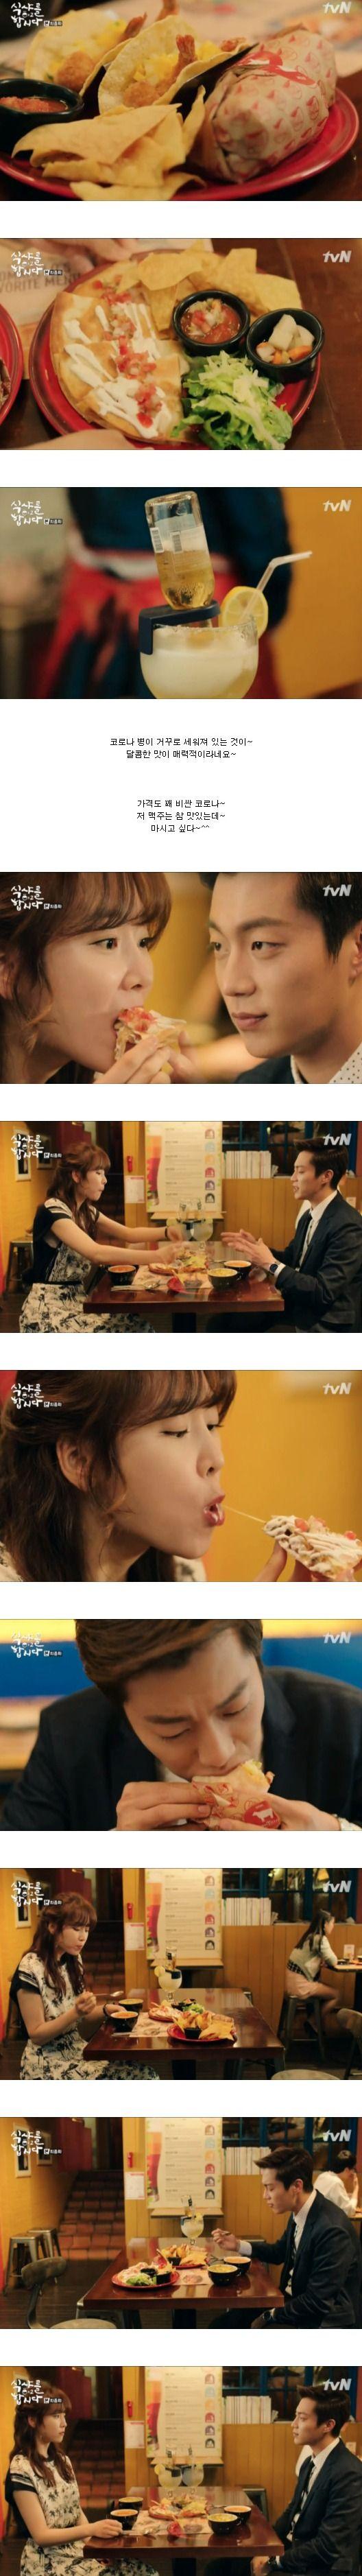 [Spoiler] Added episode 18 captures for the Korean drama 'Let's Eat - Season 2' @ HanCinema :: The Korean Movie and Drama Database